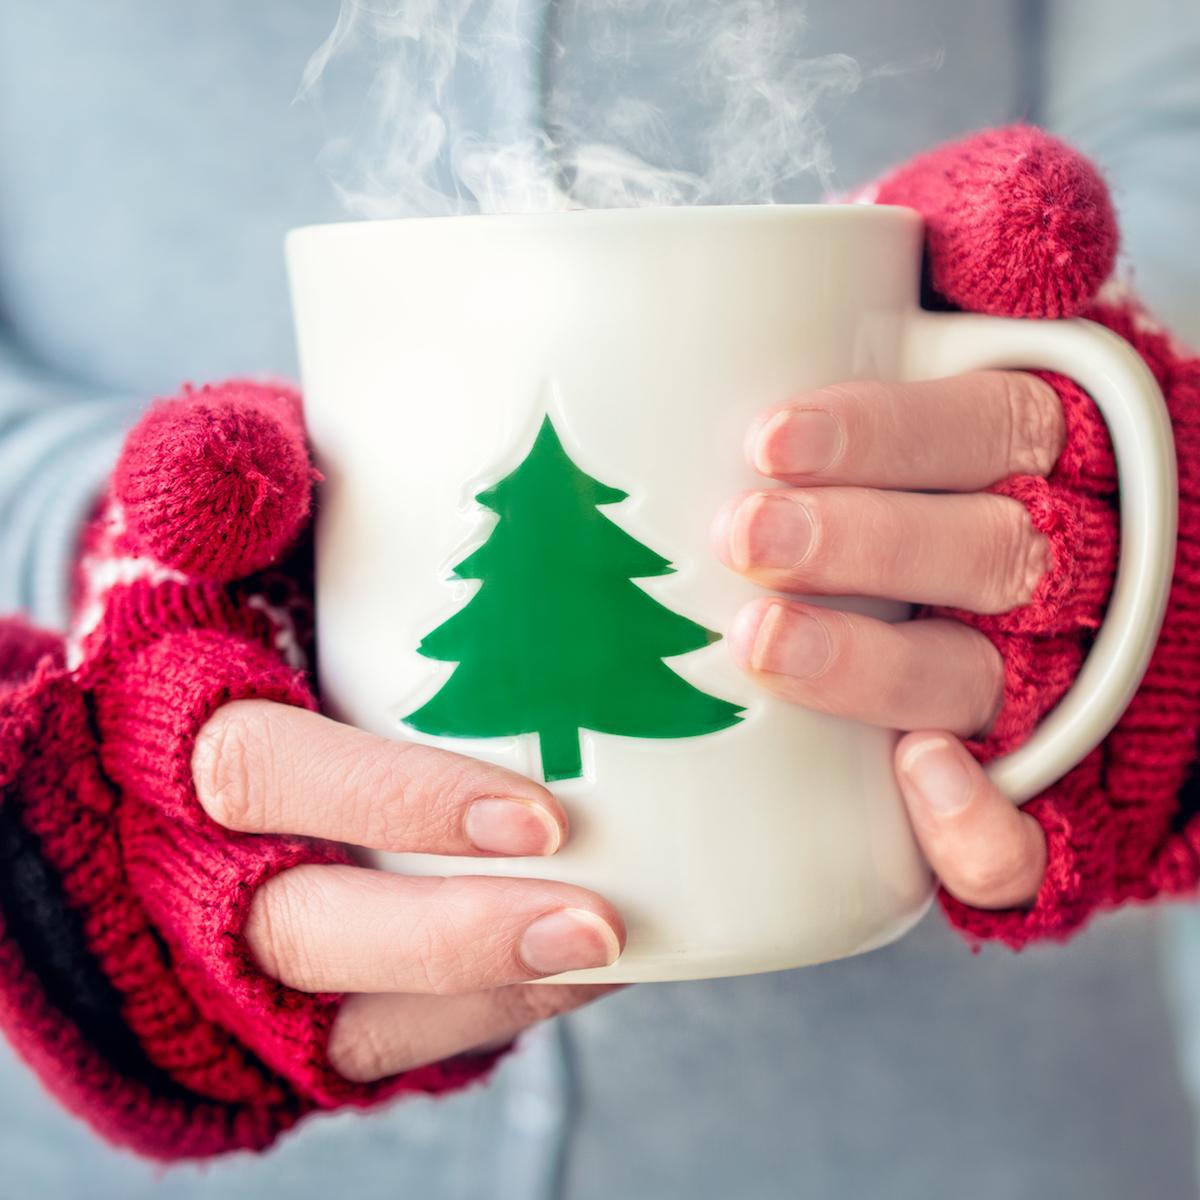 Thé de Noël ©e llaszlo shutterstock